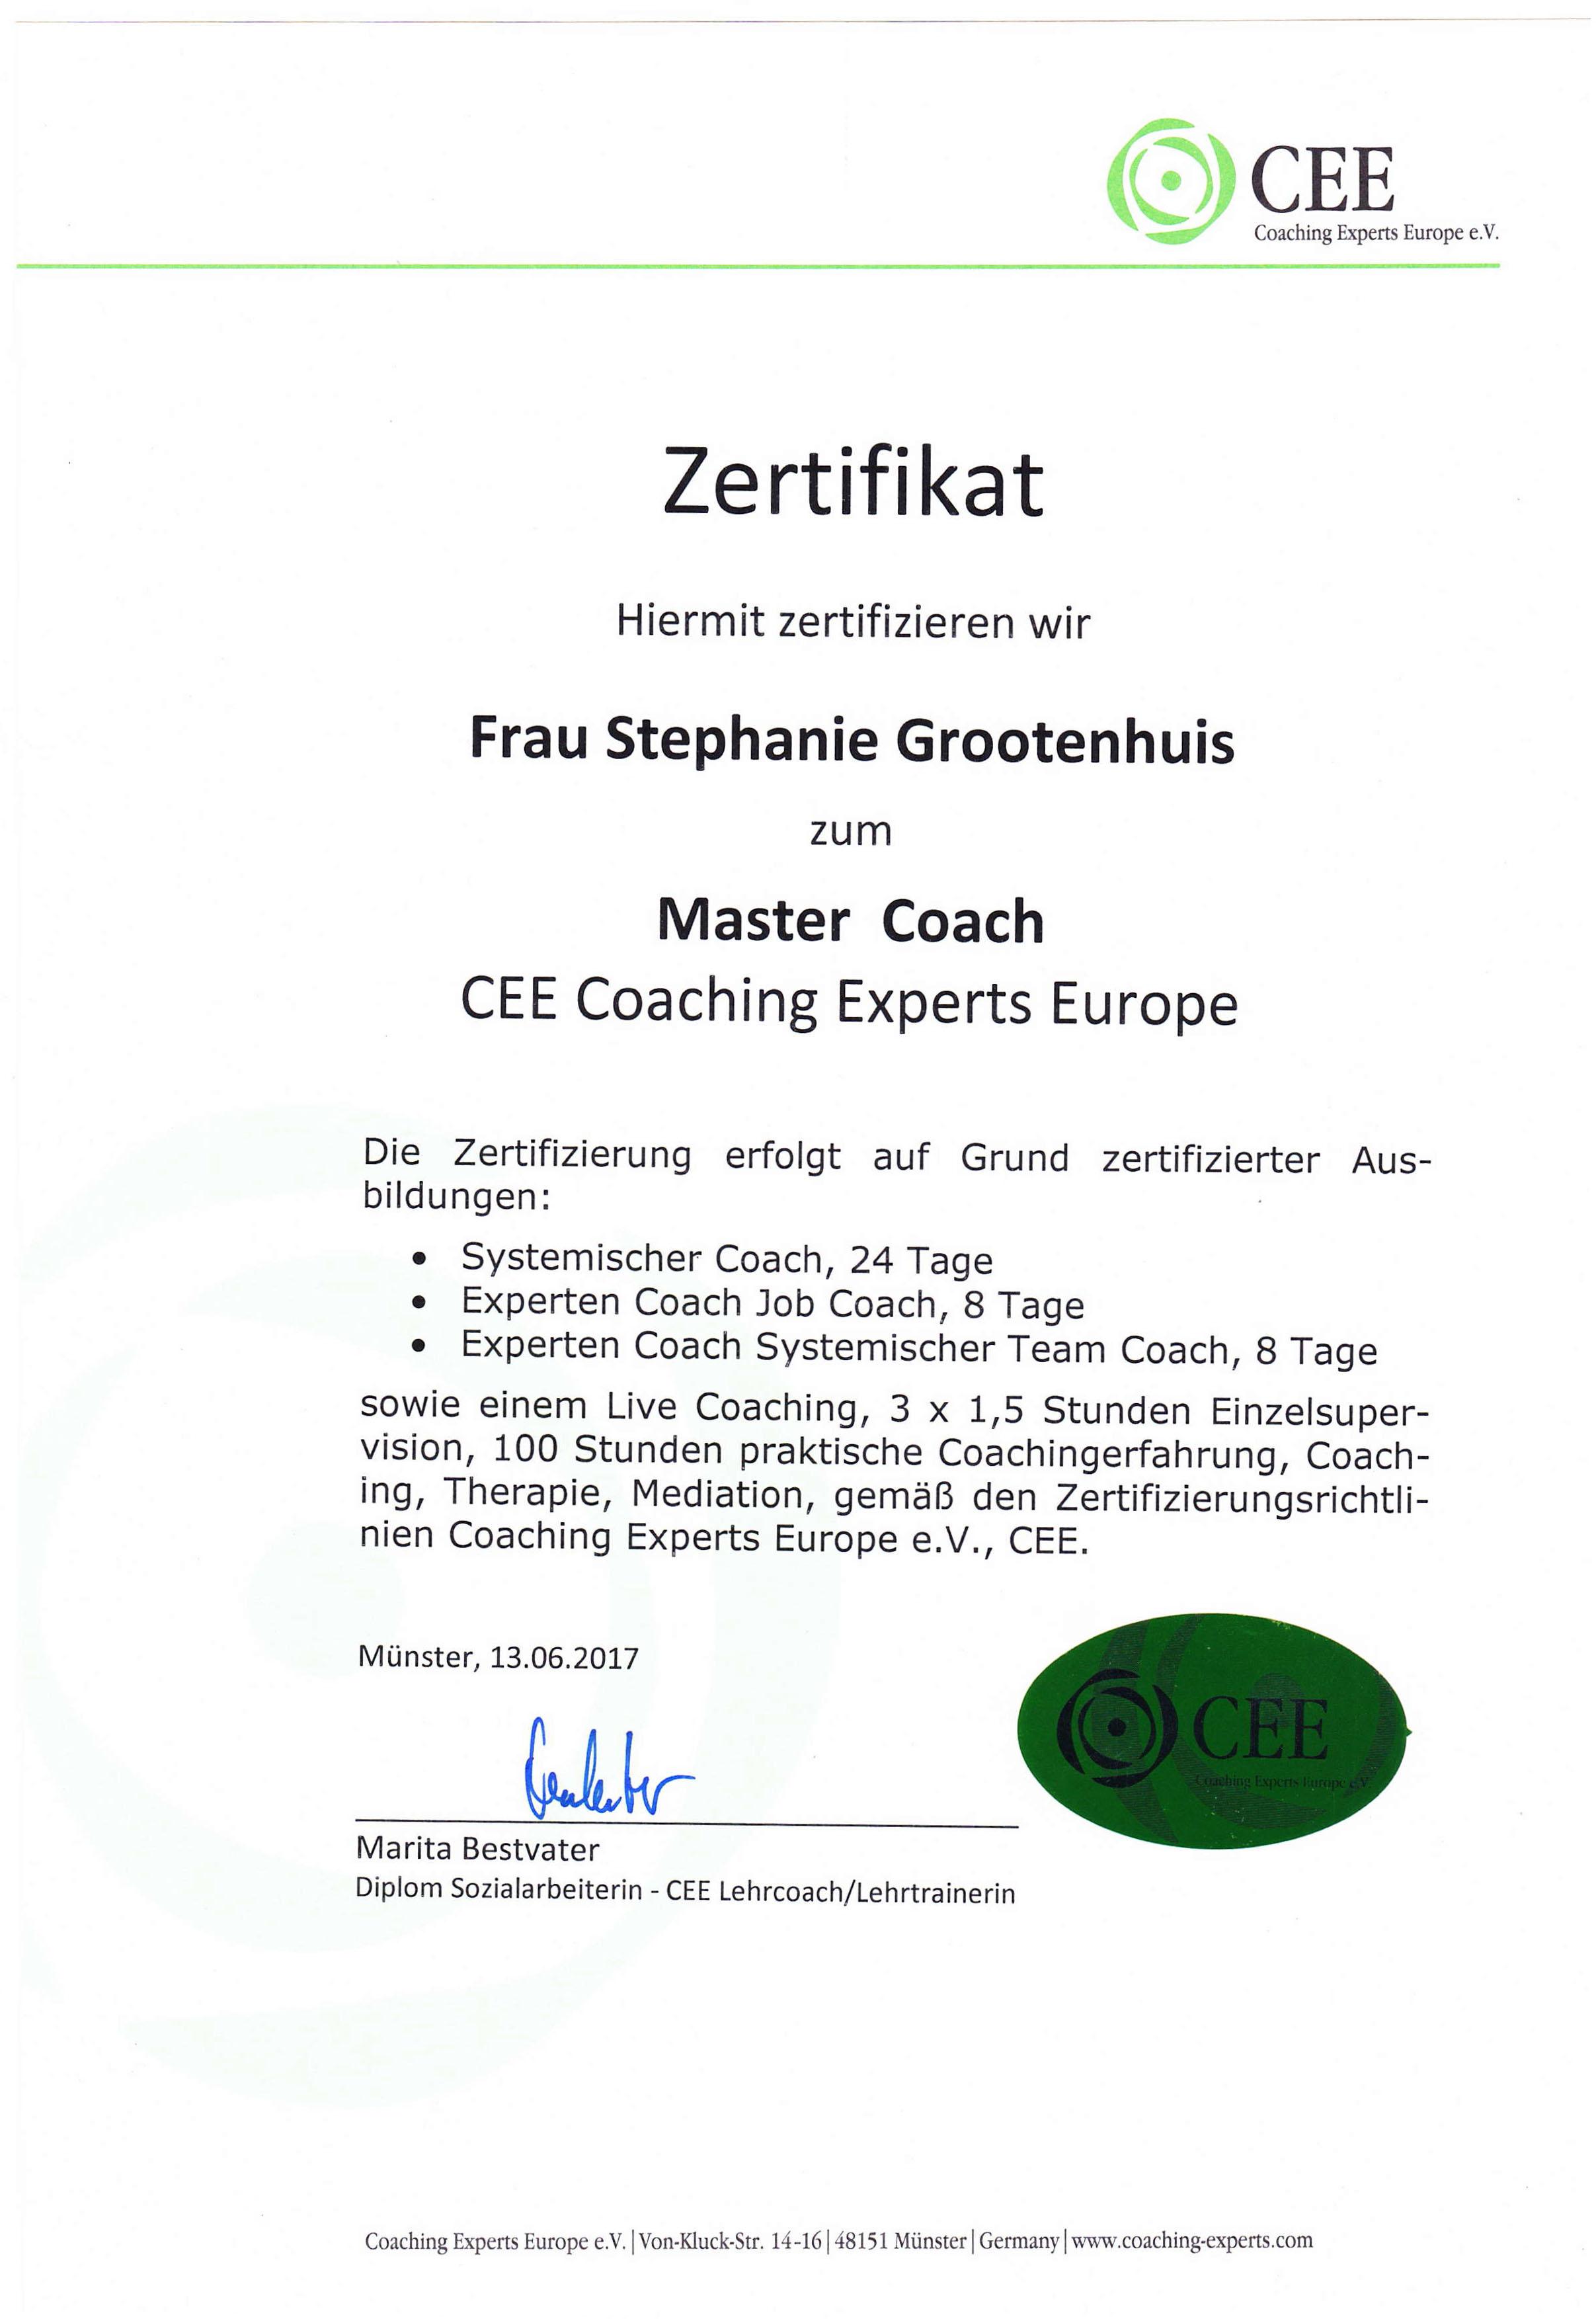 Systemischer Coach, Experten Coach, Master Coach www.jetzt-job-coach.de